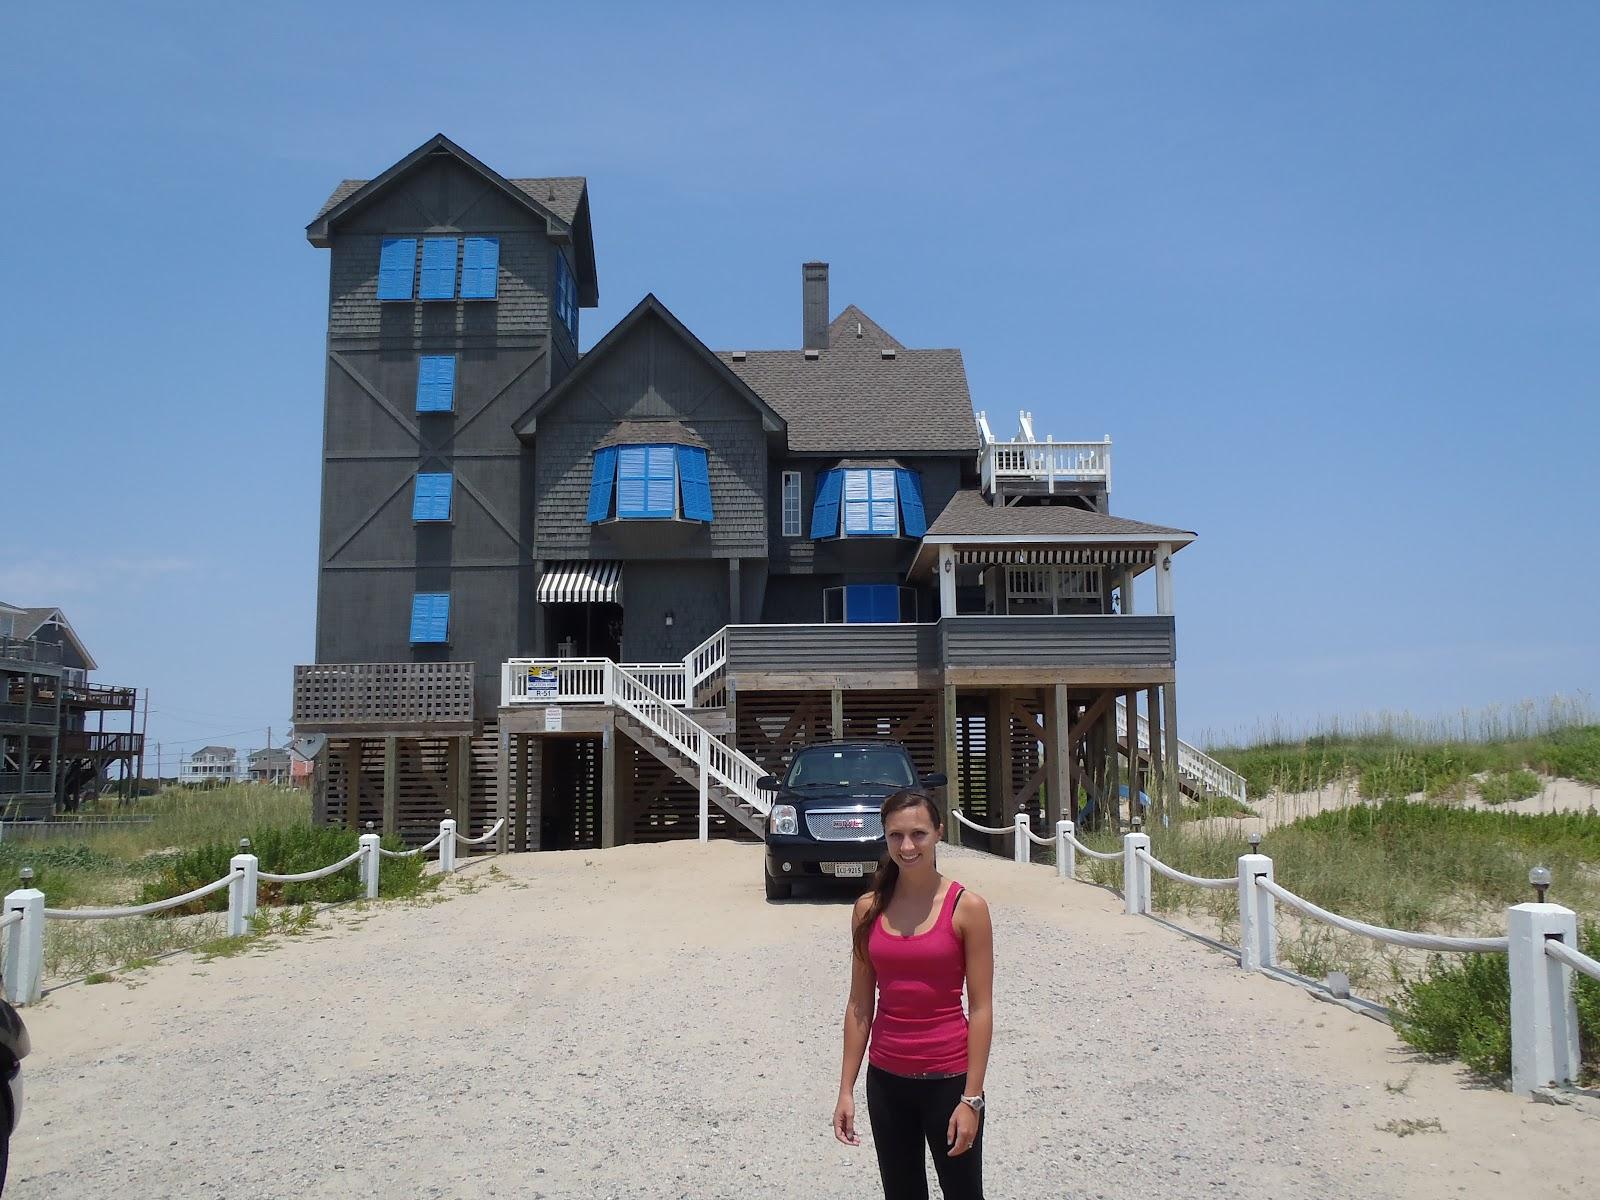 Nights In Rodanthe House On Beach Part - 15: Nights In Rodanthe House